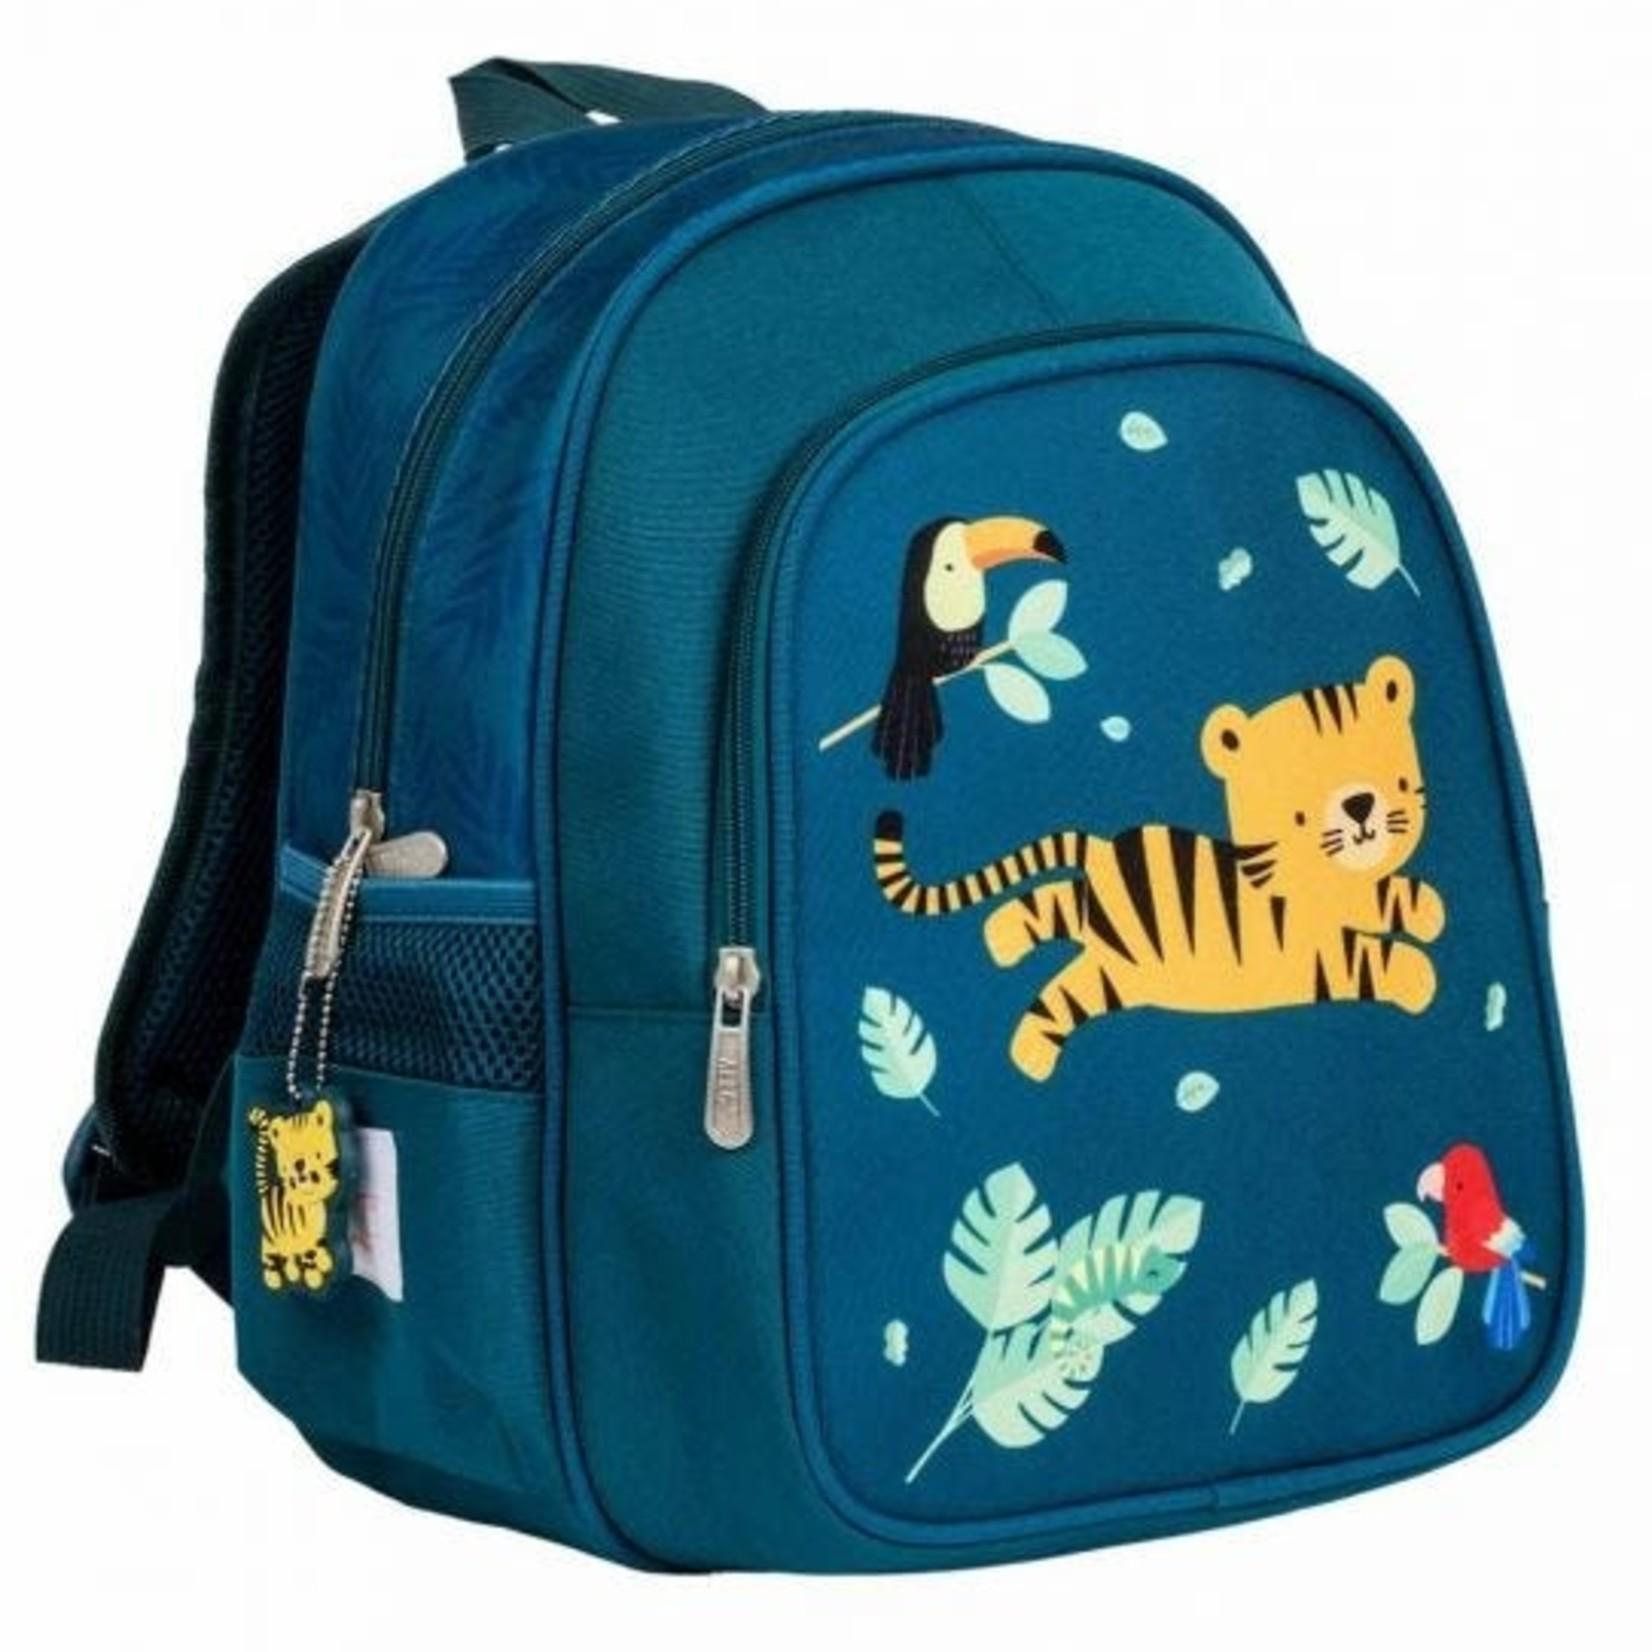 A little lovely company Rugzak - Jungle tijger - Koelelement - Groen